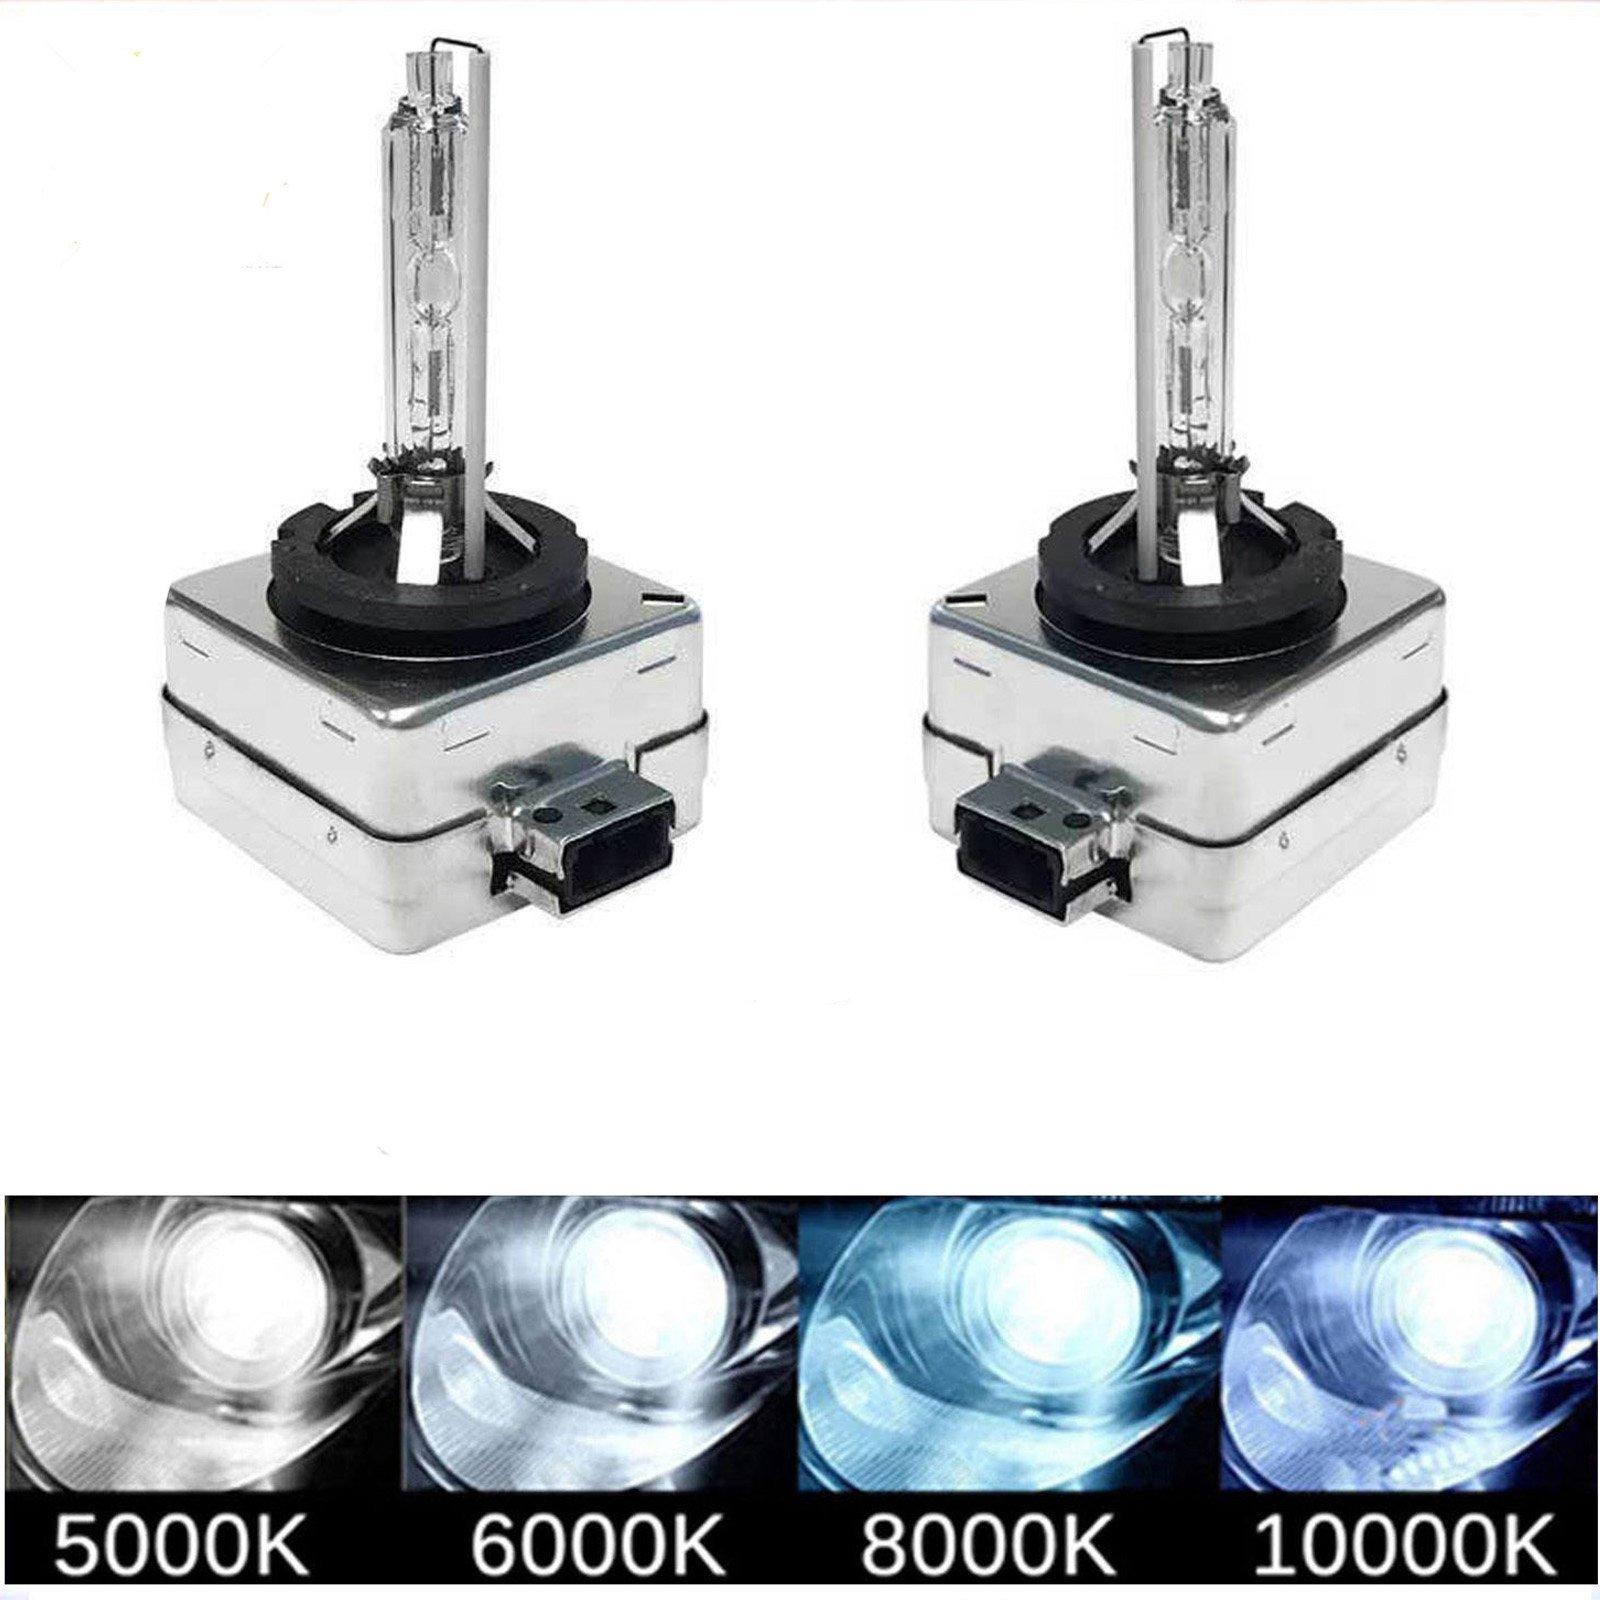 D1S D1C D1R 6000K HID Xenon Bulbs Diamond White 35W Car Headlight Lamp Super Bright OEM Factory Replce 66141 66142 85415C1 85415 Plug & Play (Set of 2)